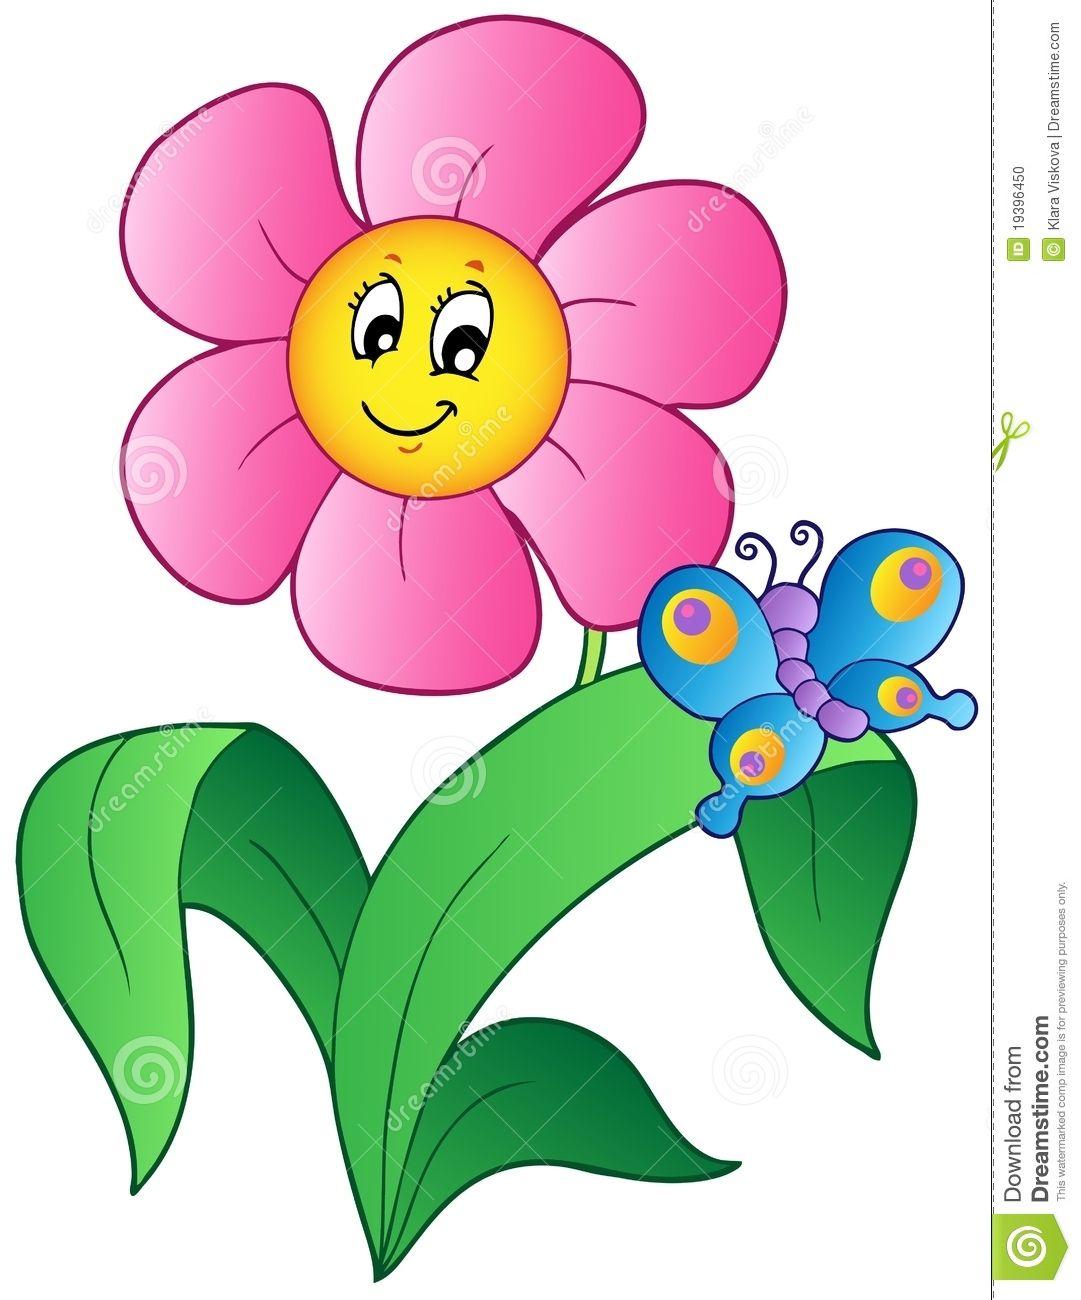 butterfly flower cartoon images.